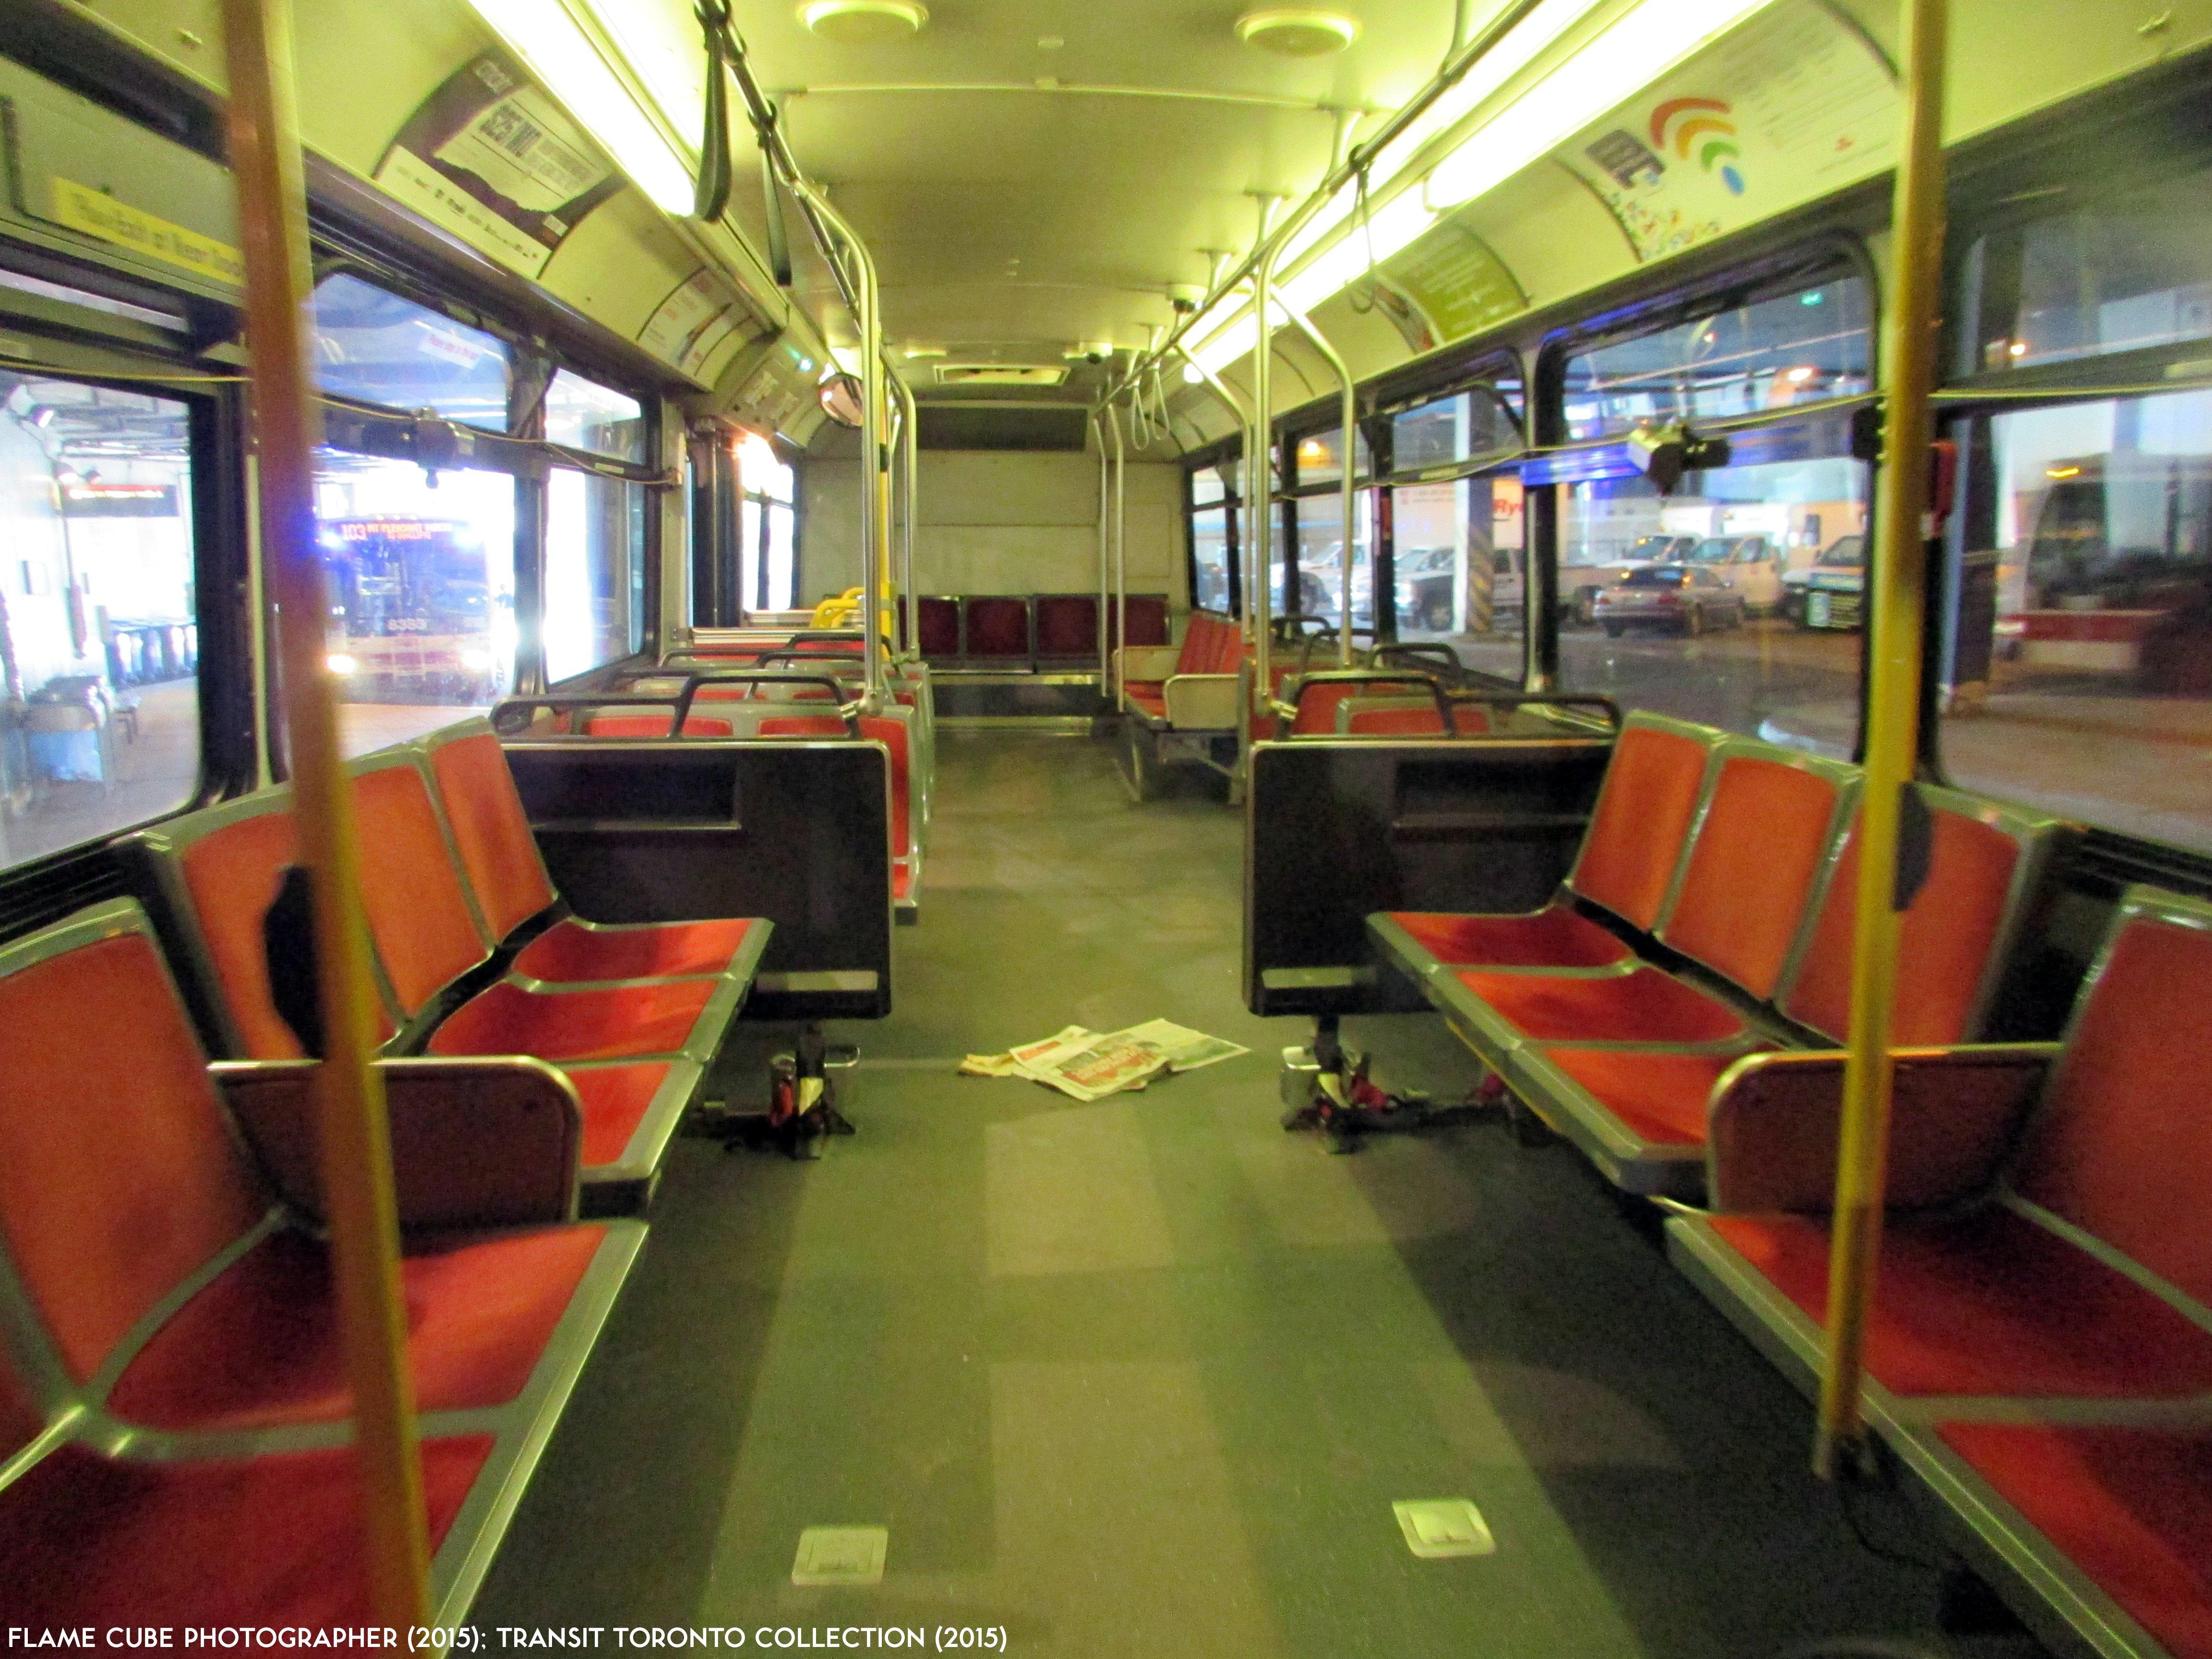 Garage Interior Design Toronto: Transit Toronto Image: TTC 9419 Interior